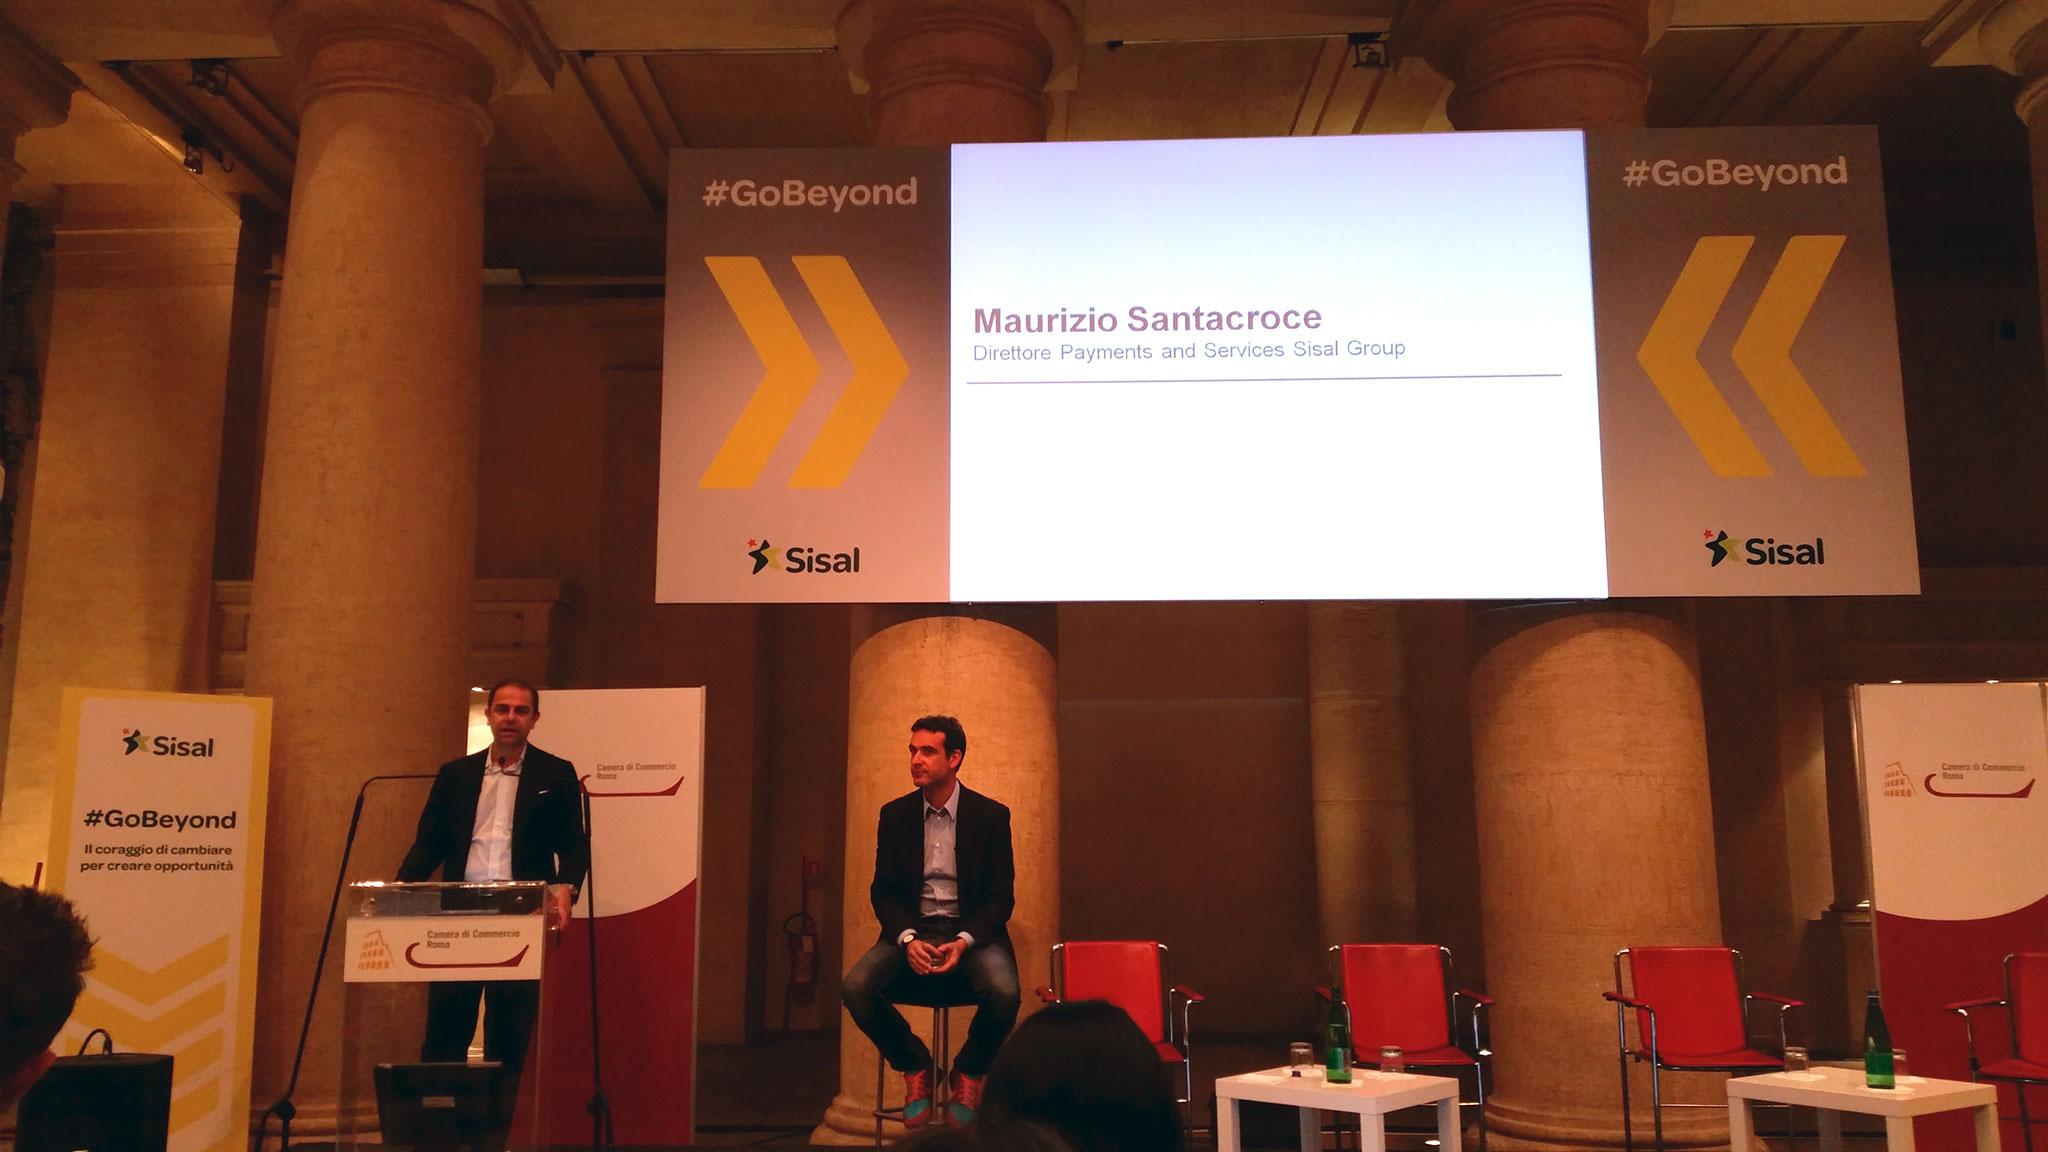 #GoBeyond Maurizio Santacroce (SisalPay)